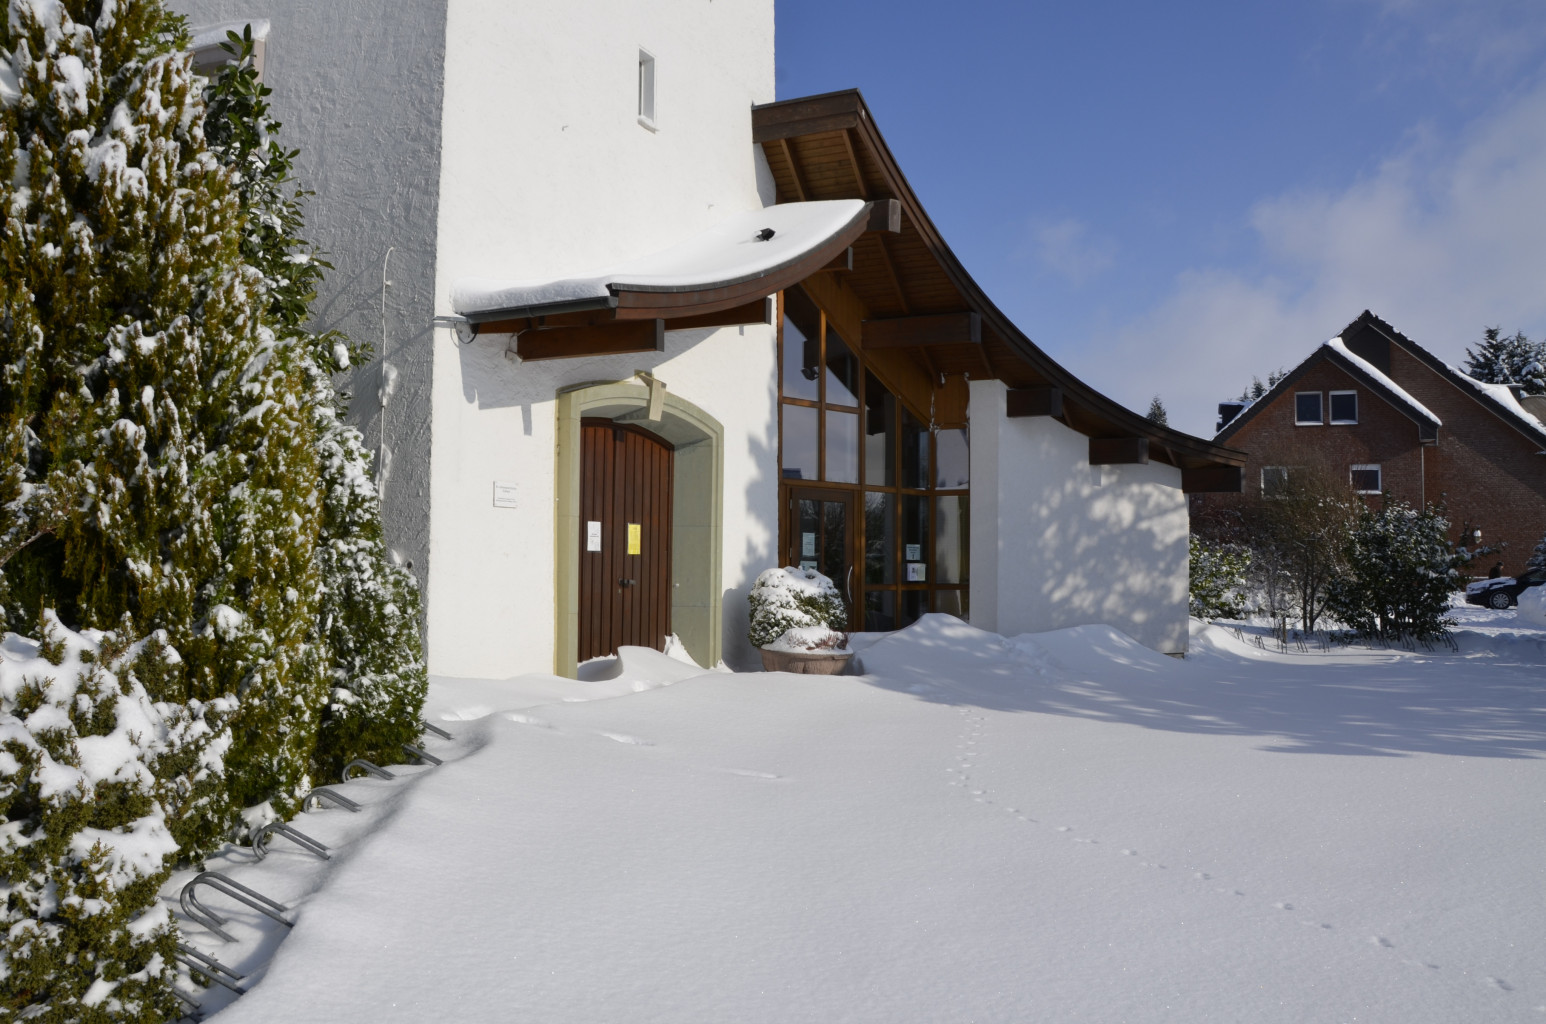 Kirche Sylbach Winter Axel Schwarze 7